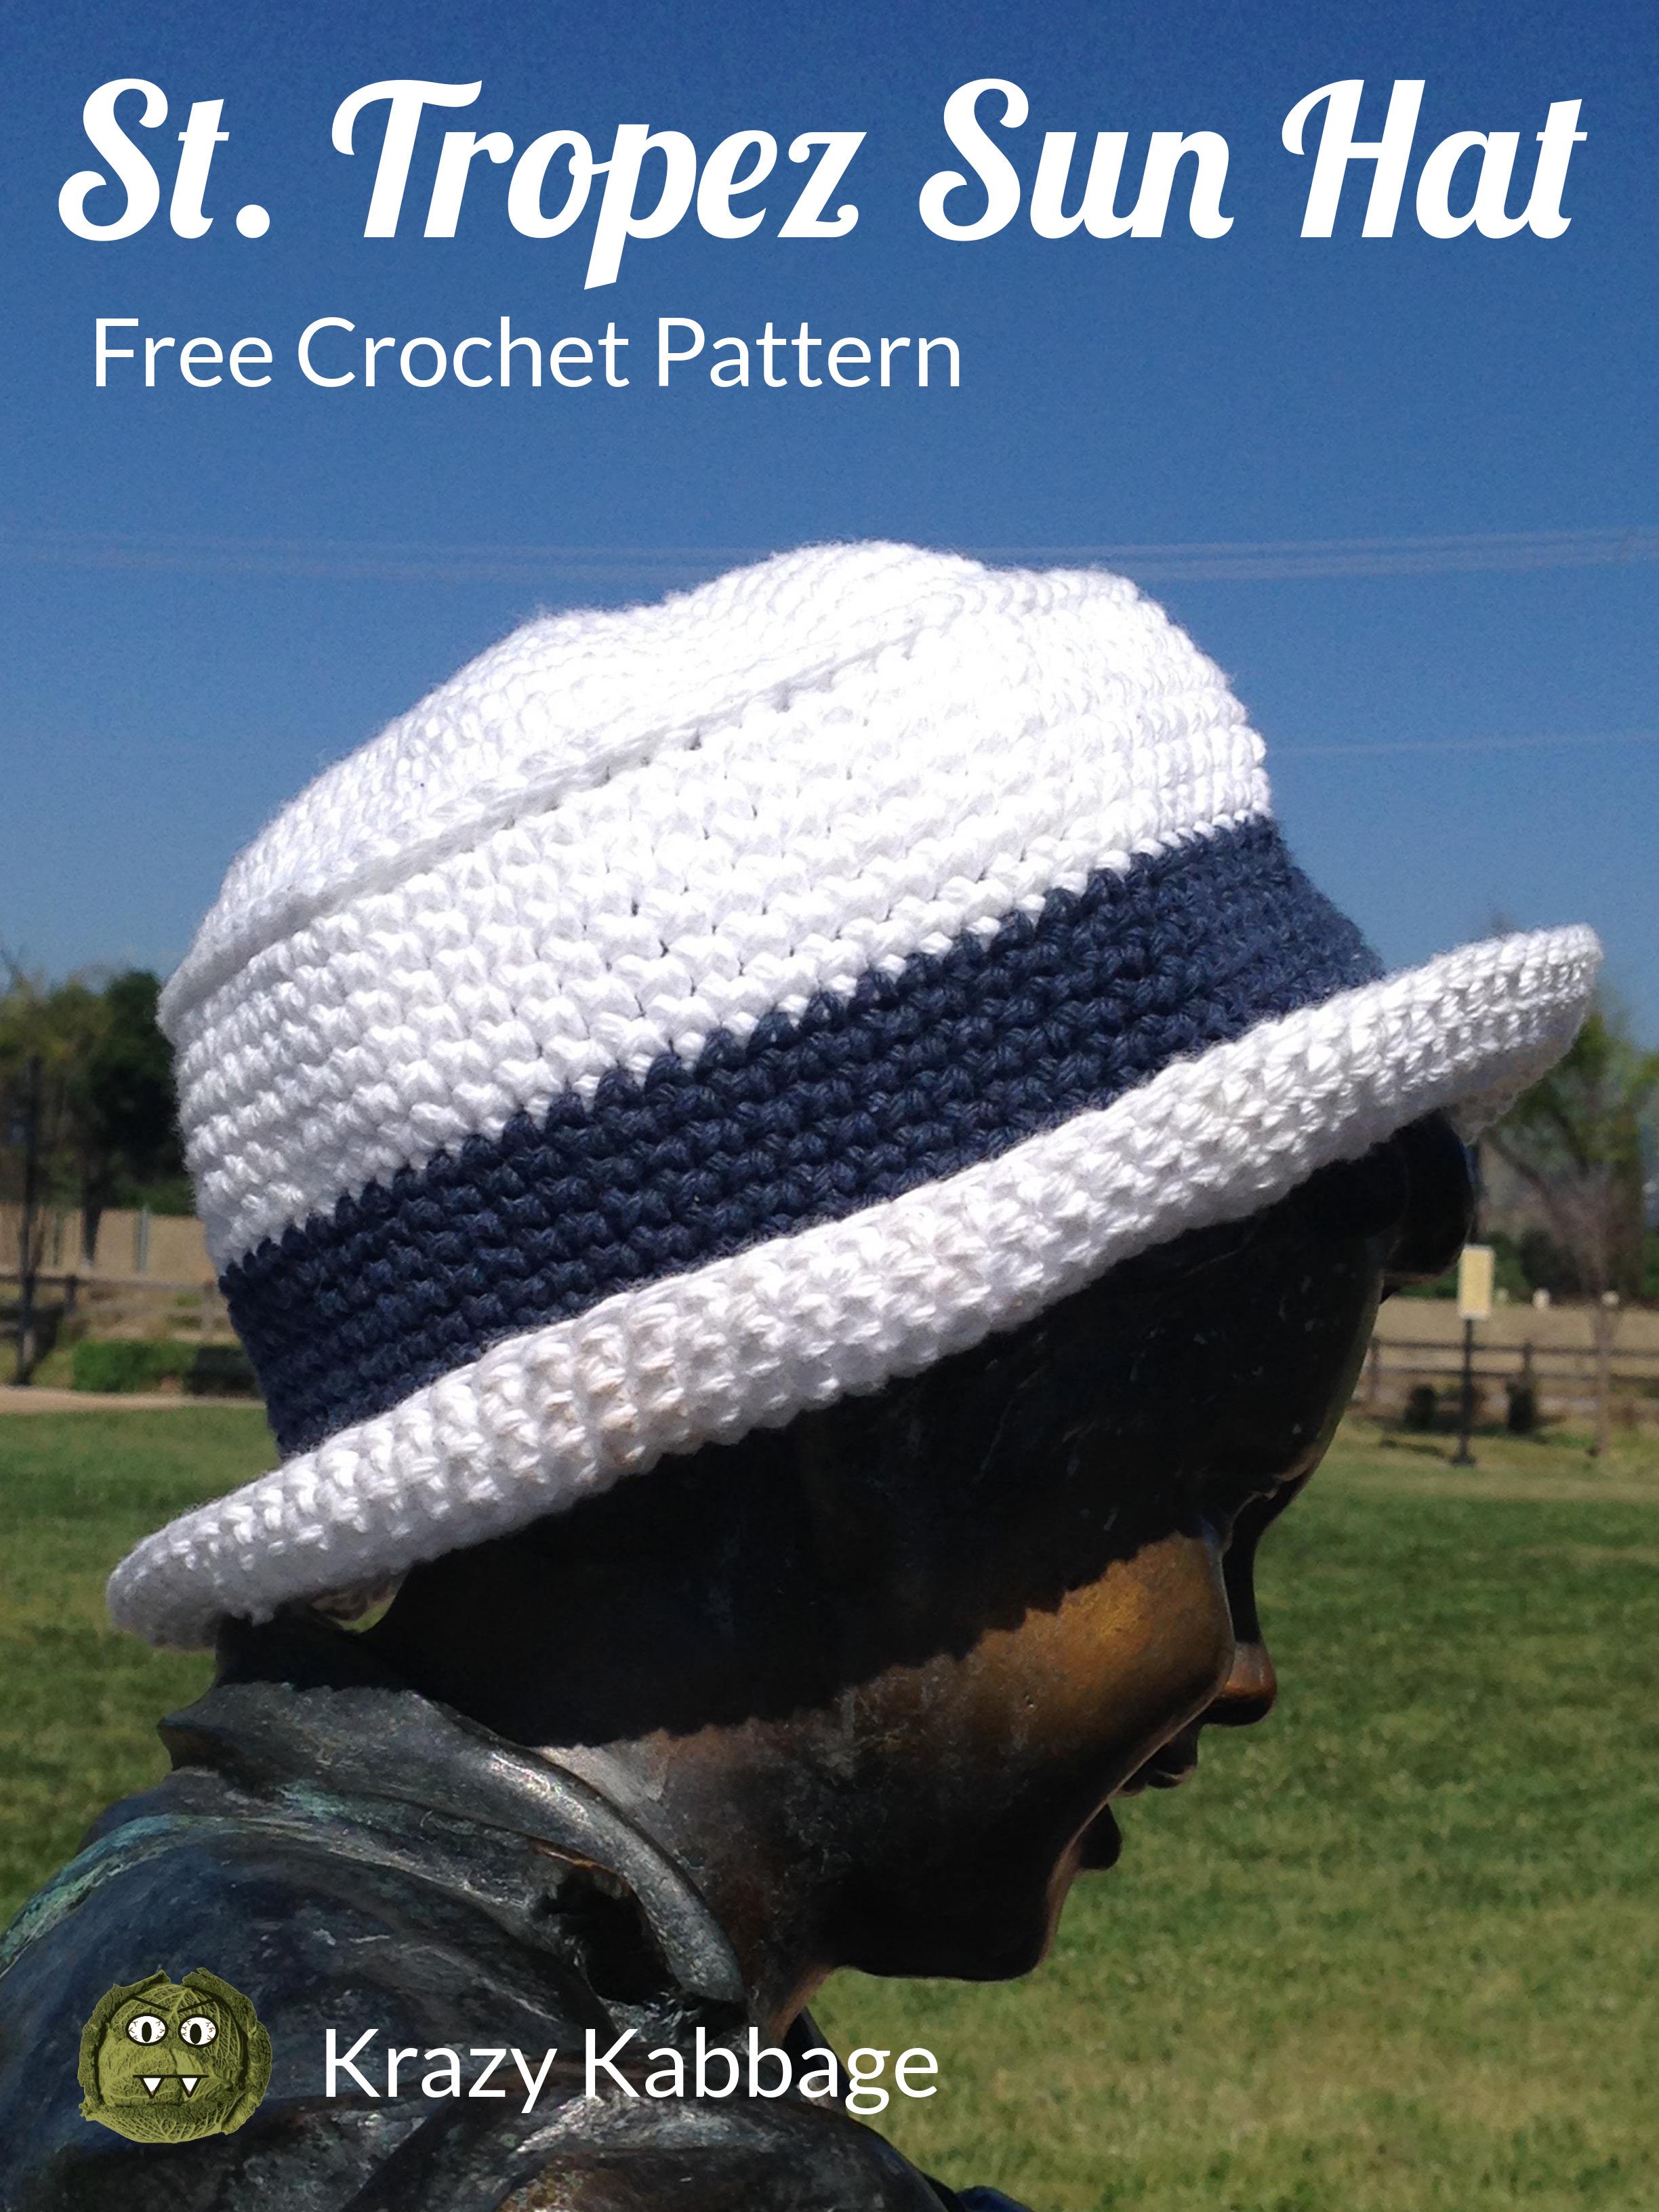 St. Tropez Sun Hat Free Crochet Pattern – Krazy Kabbage